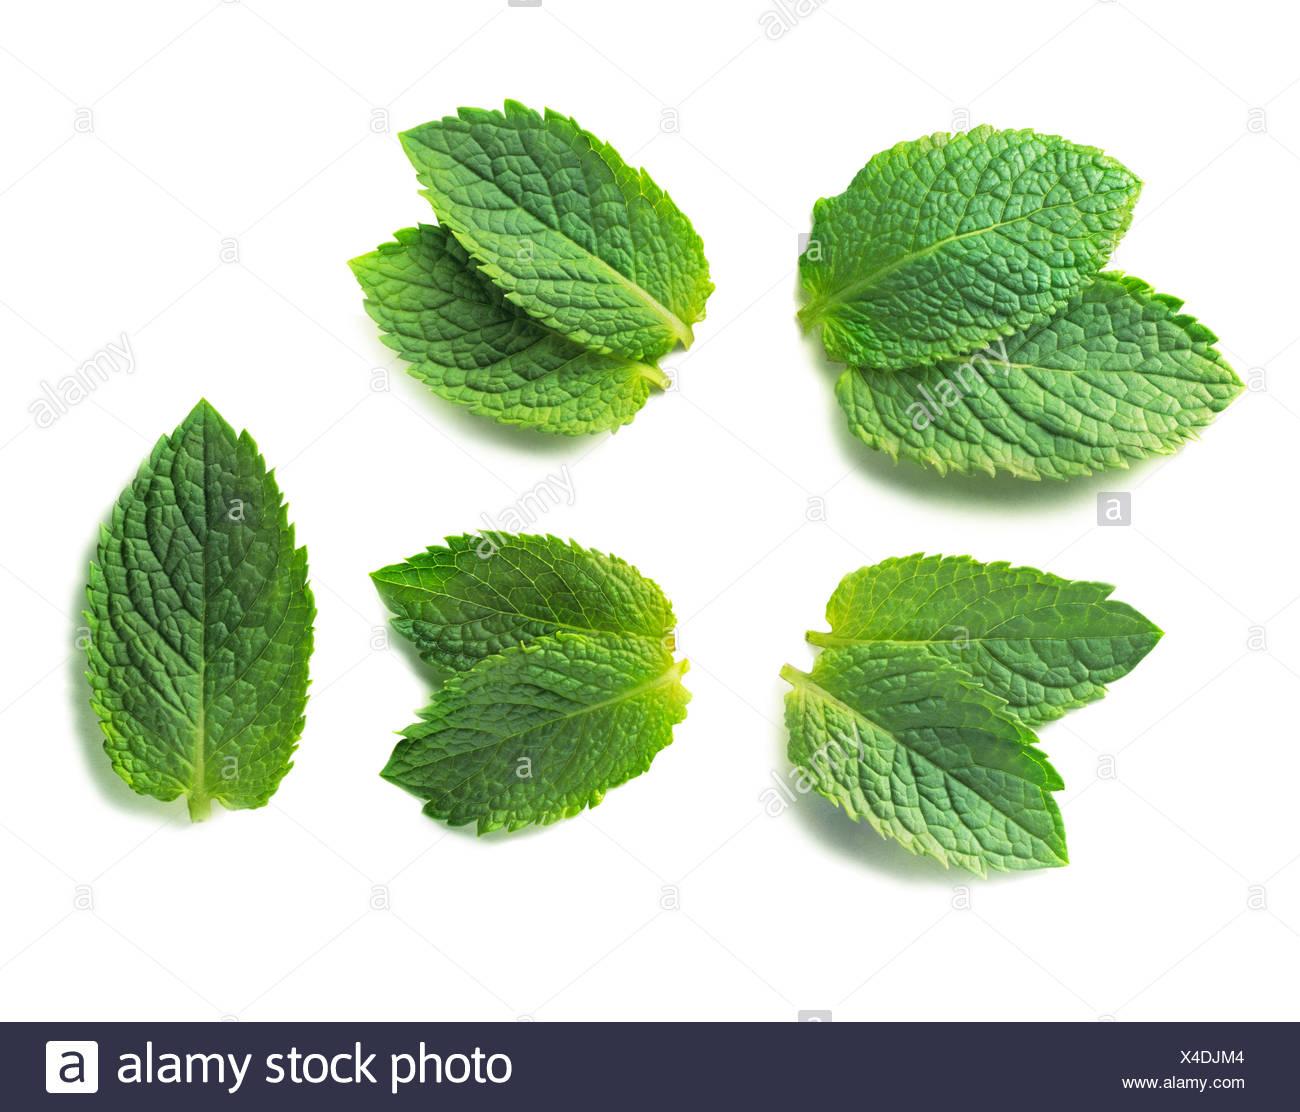 Mentha piperita, Mint, Peppermint - Stock Image